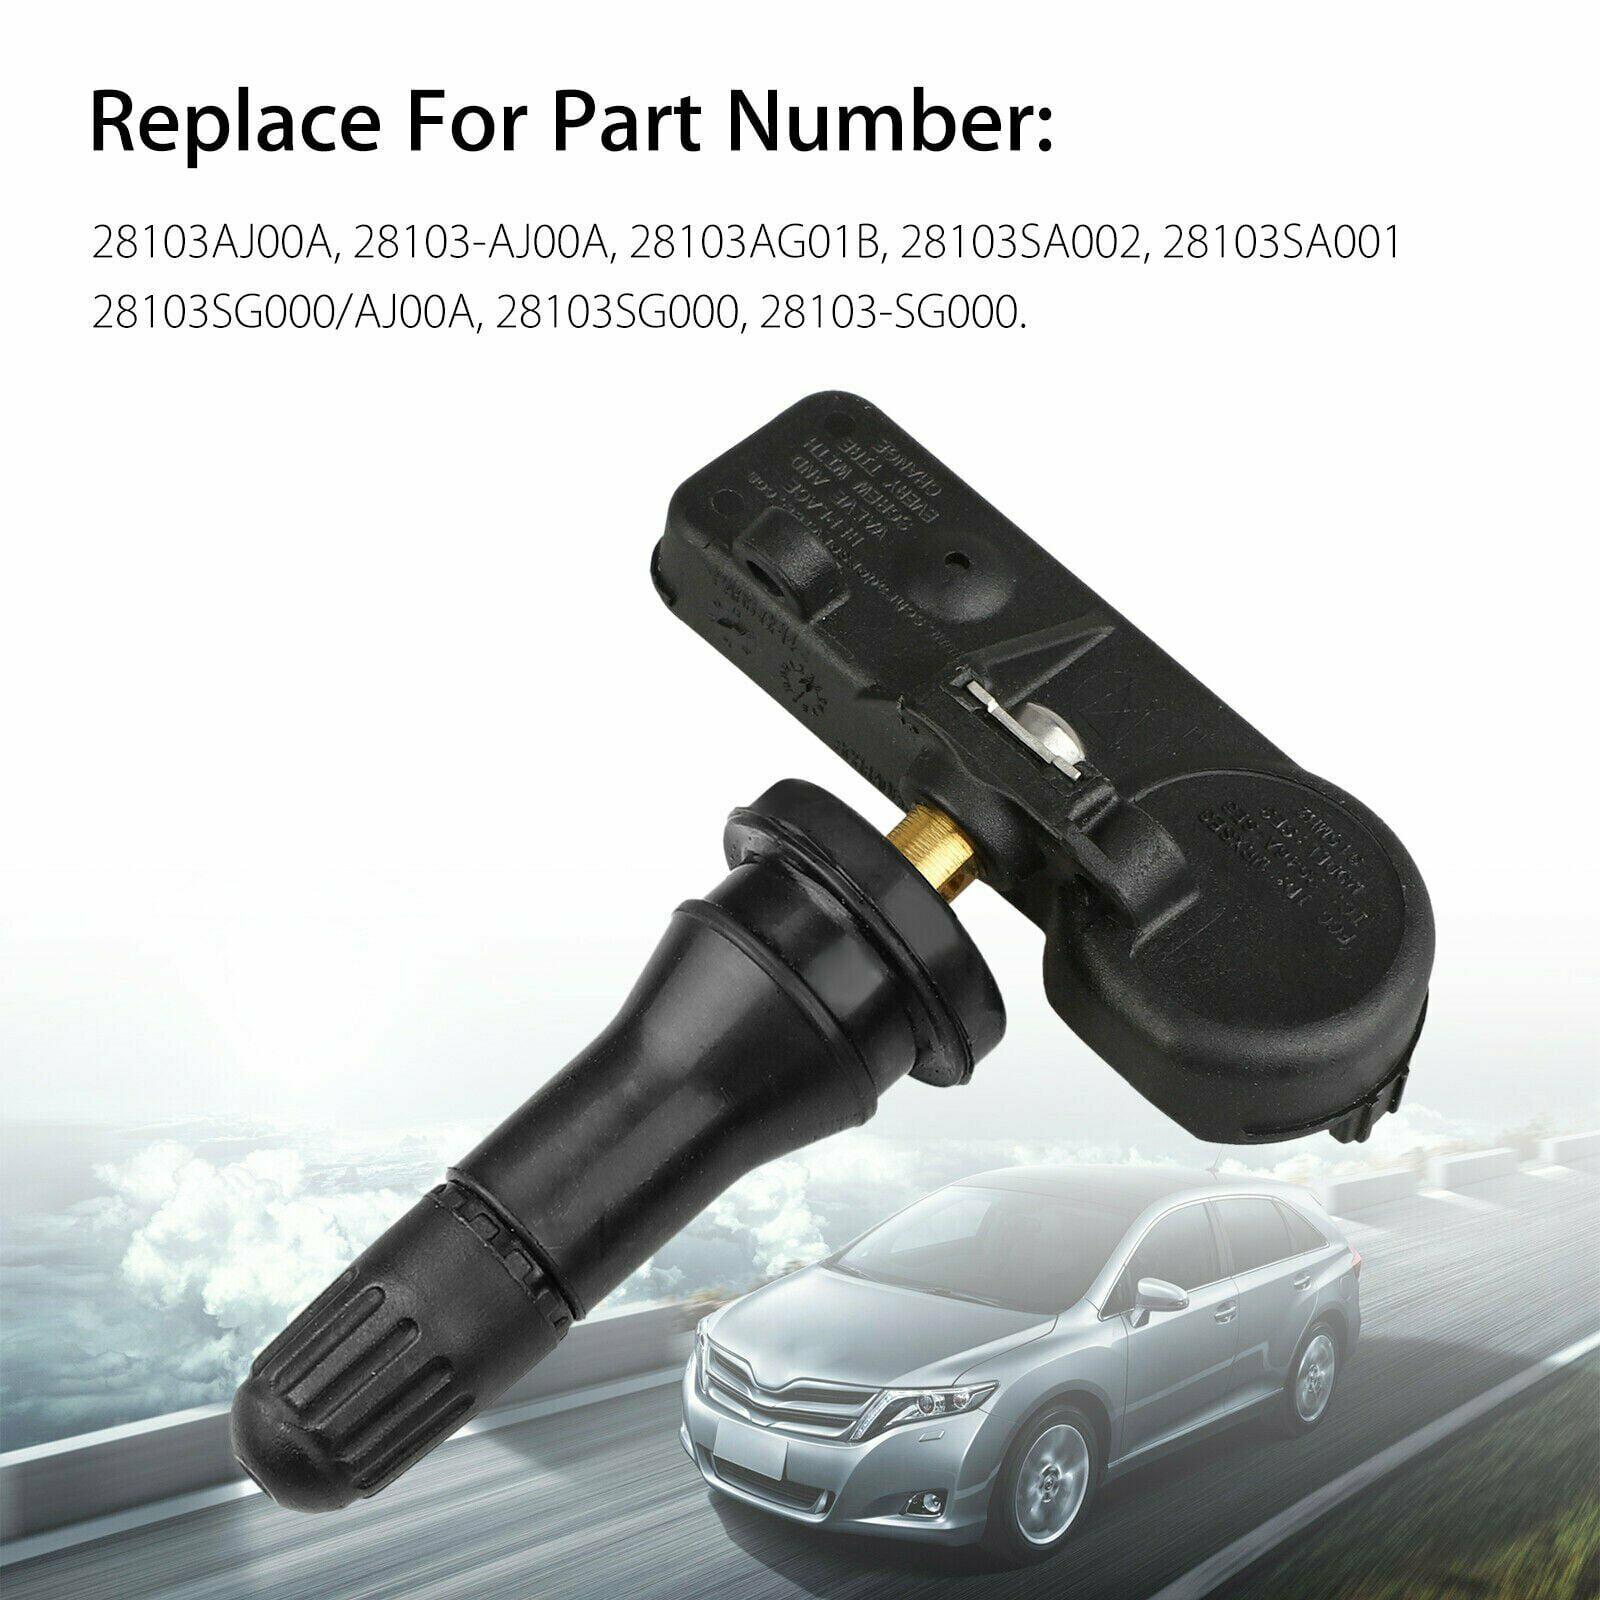 New Tire Air Pressure Sensors TPMS for Subaru Forester Impreza 28103SG000 US